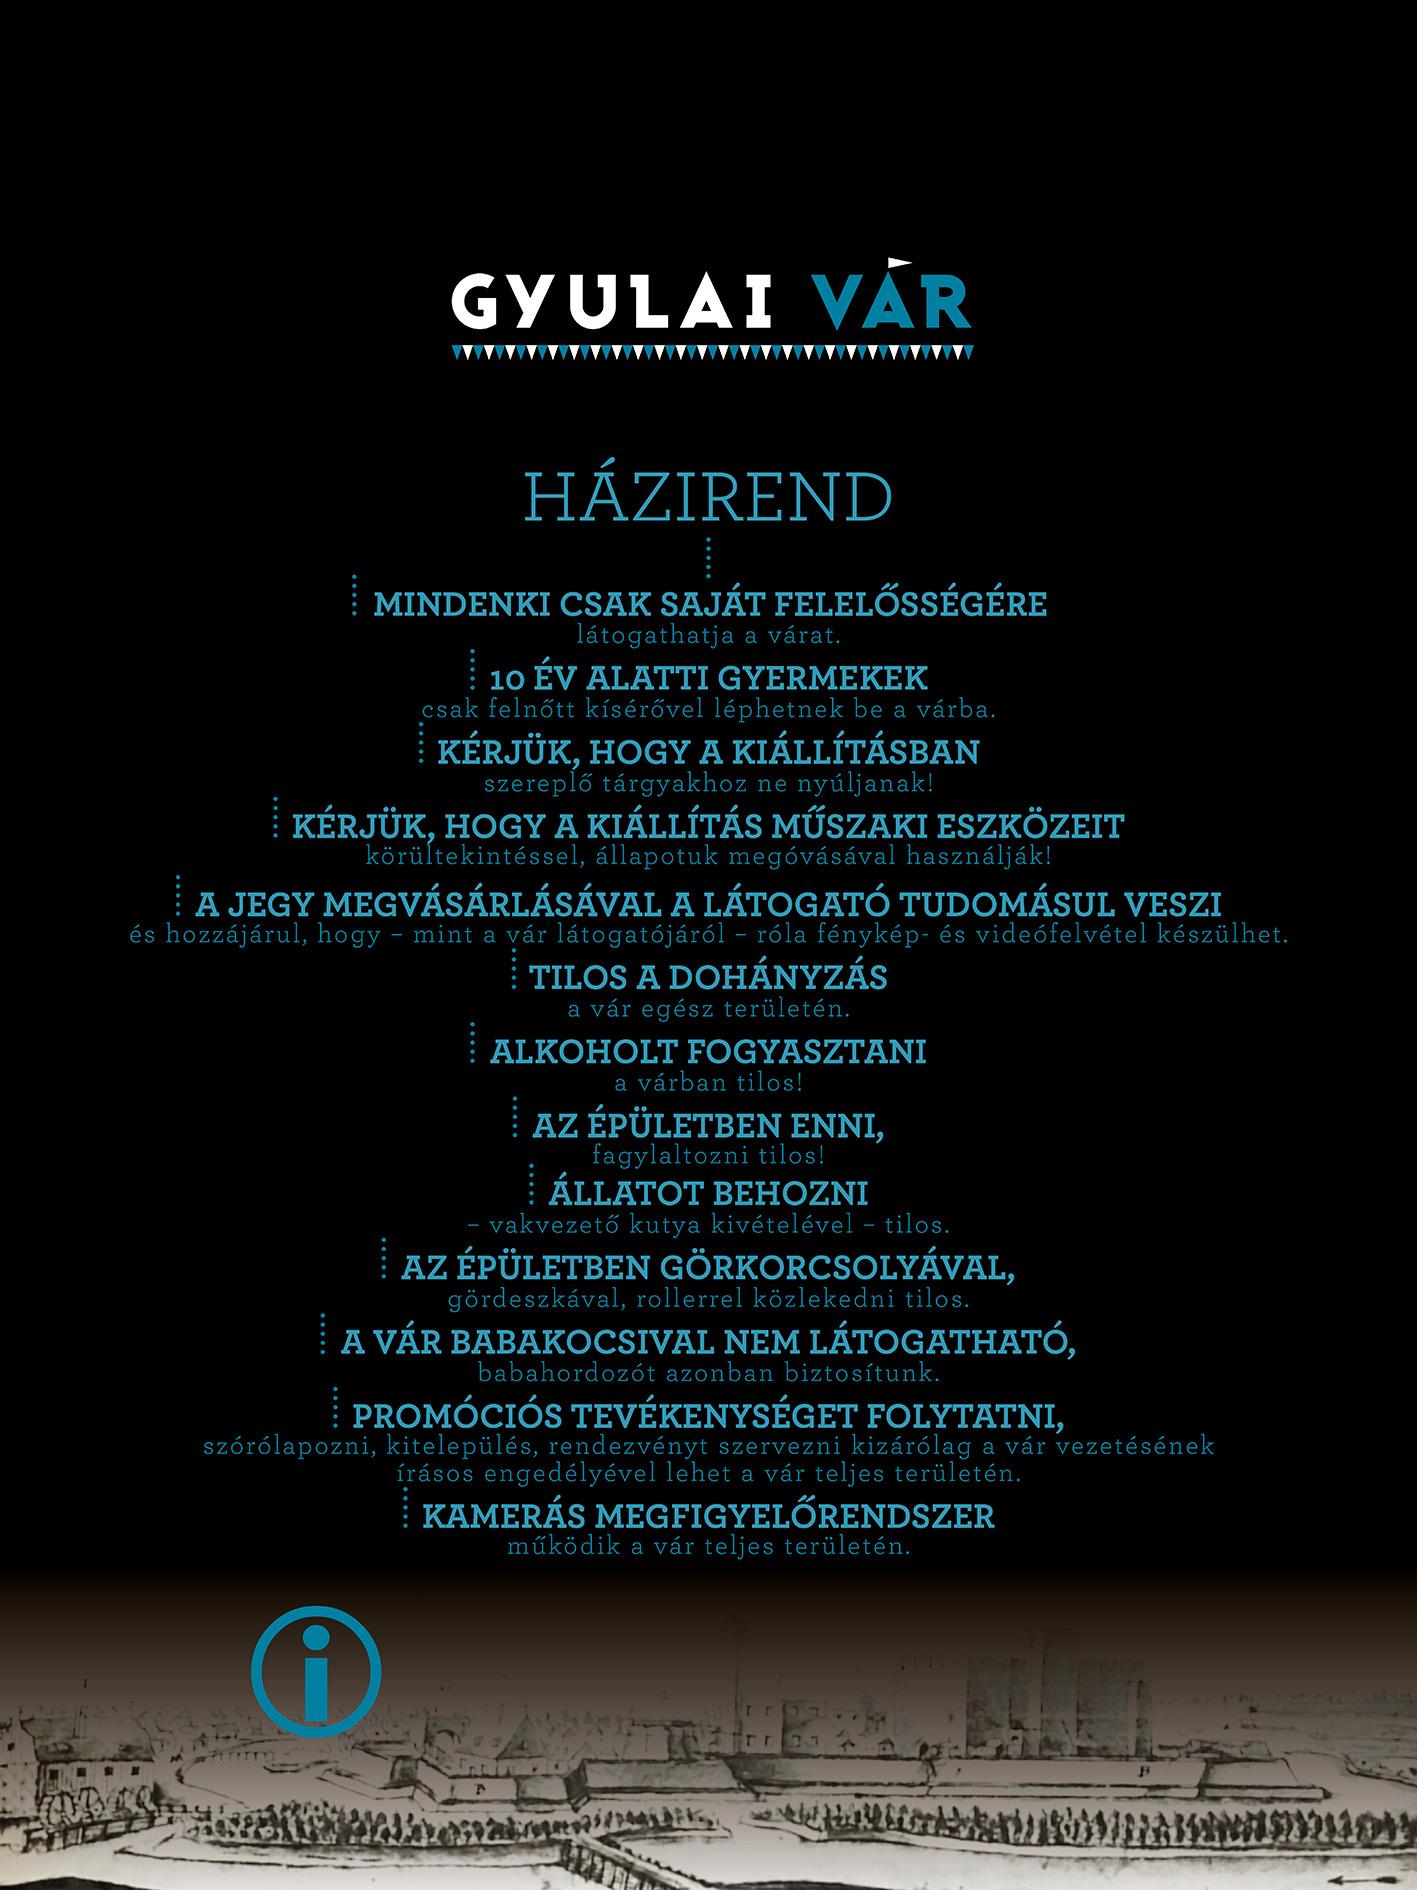 latogatoi-informaciok@gyulavara.hu_